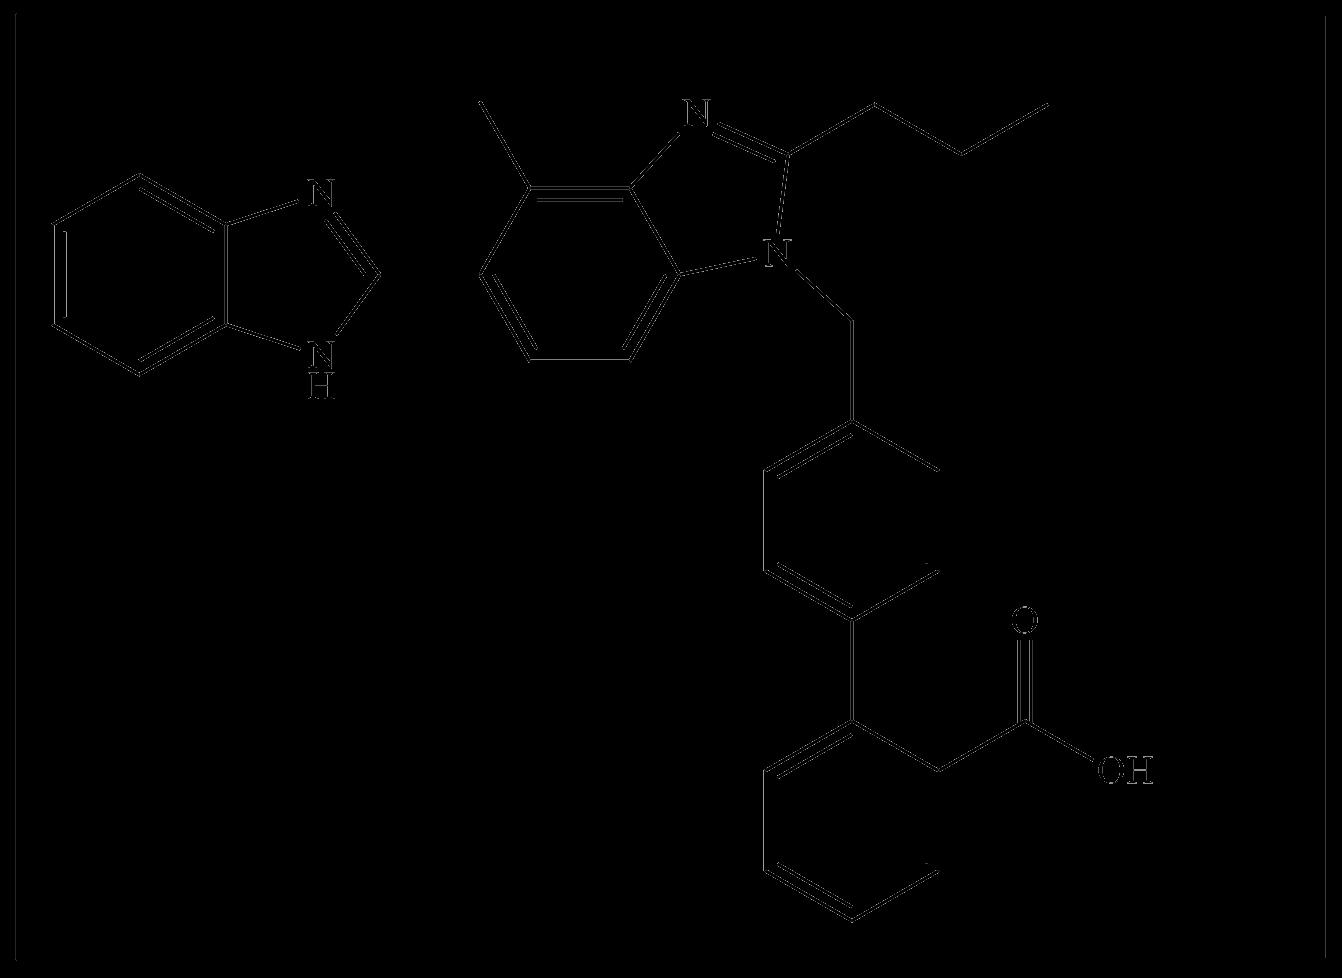 Telmisartan impurity-1 (Desmethyl Telmisartan)